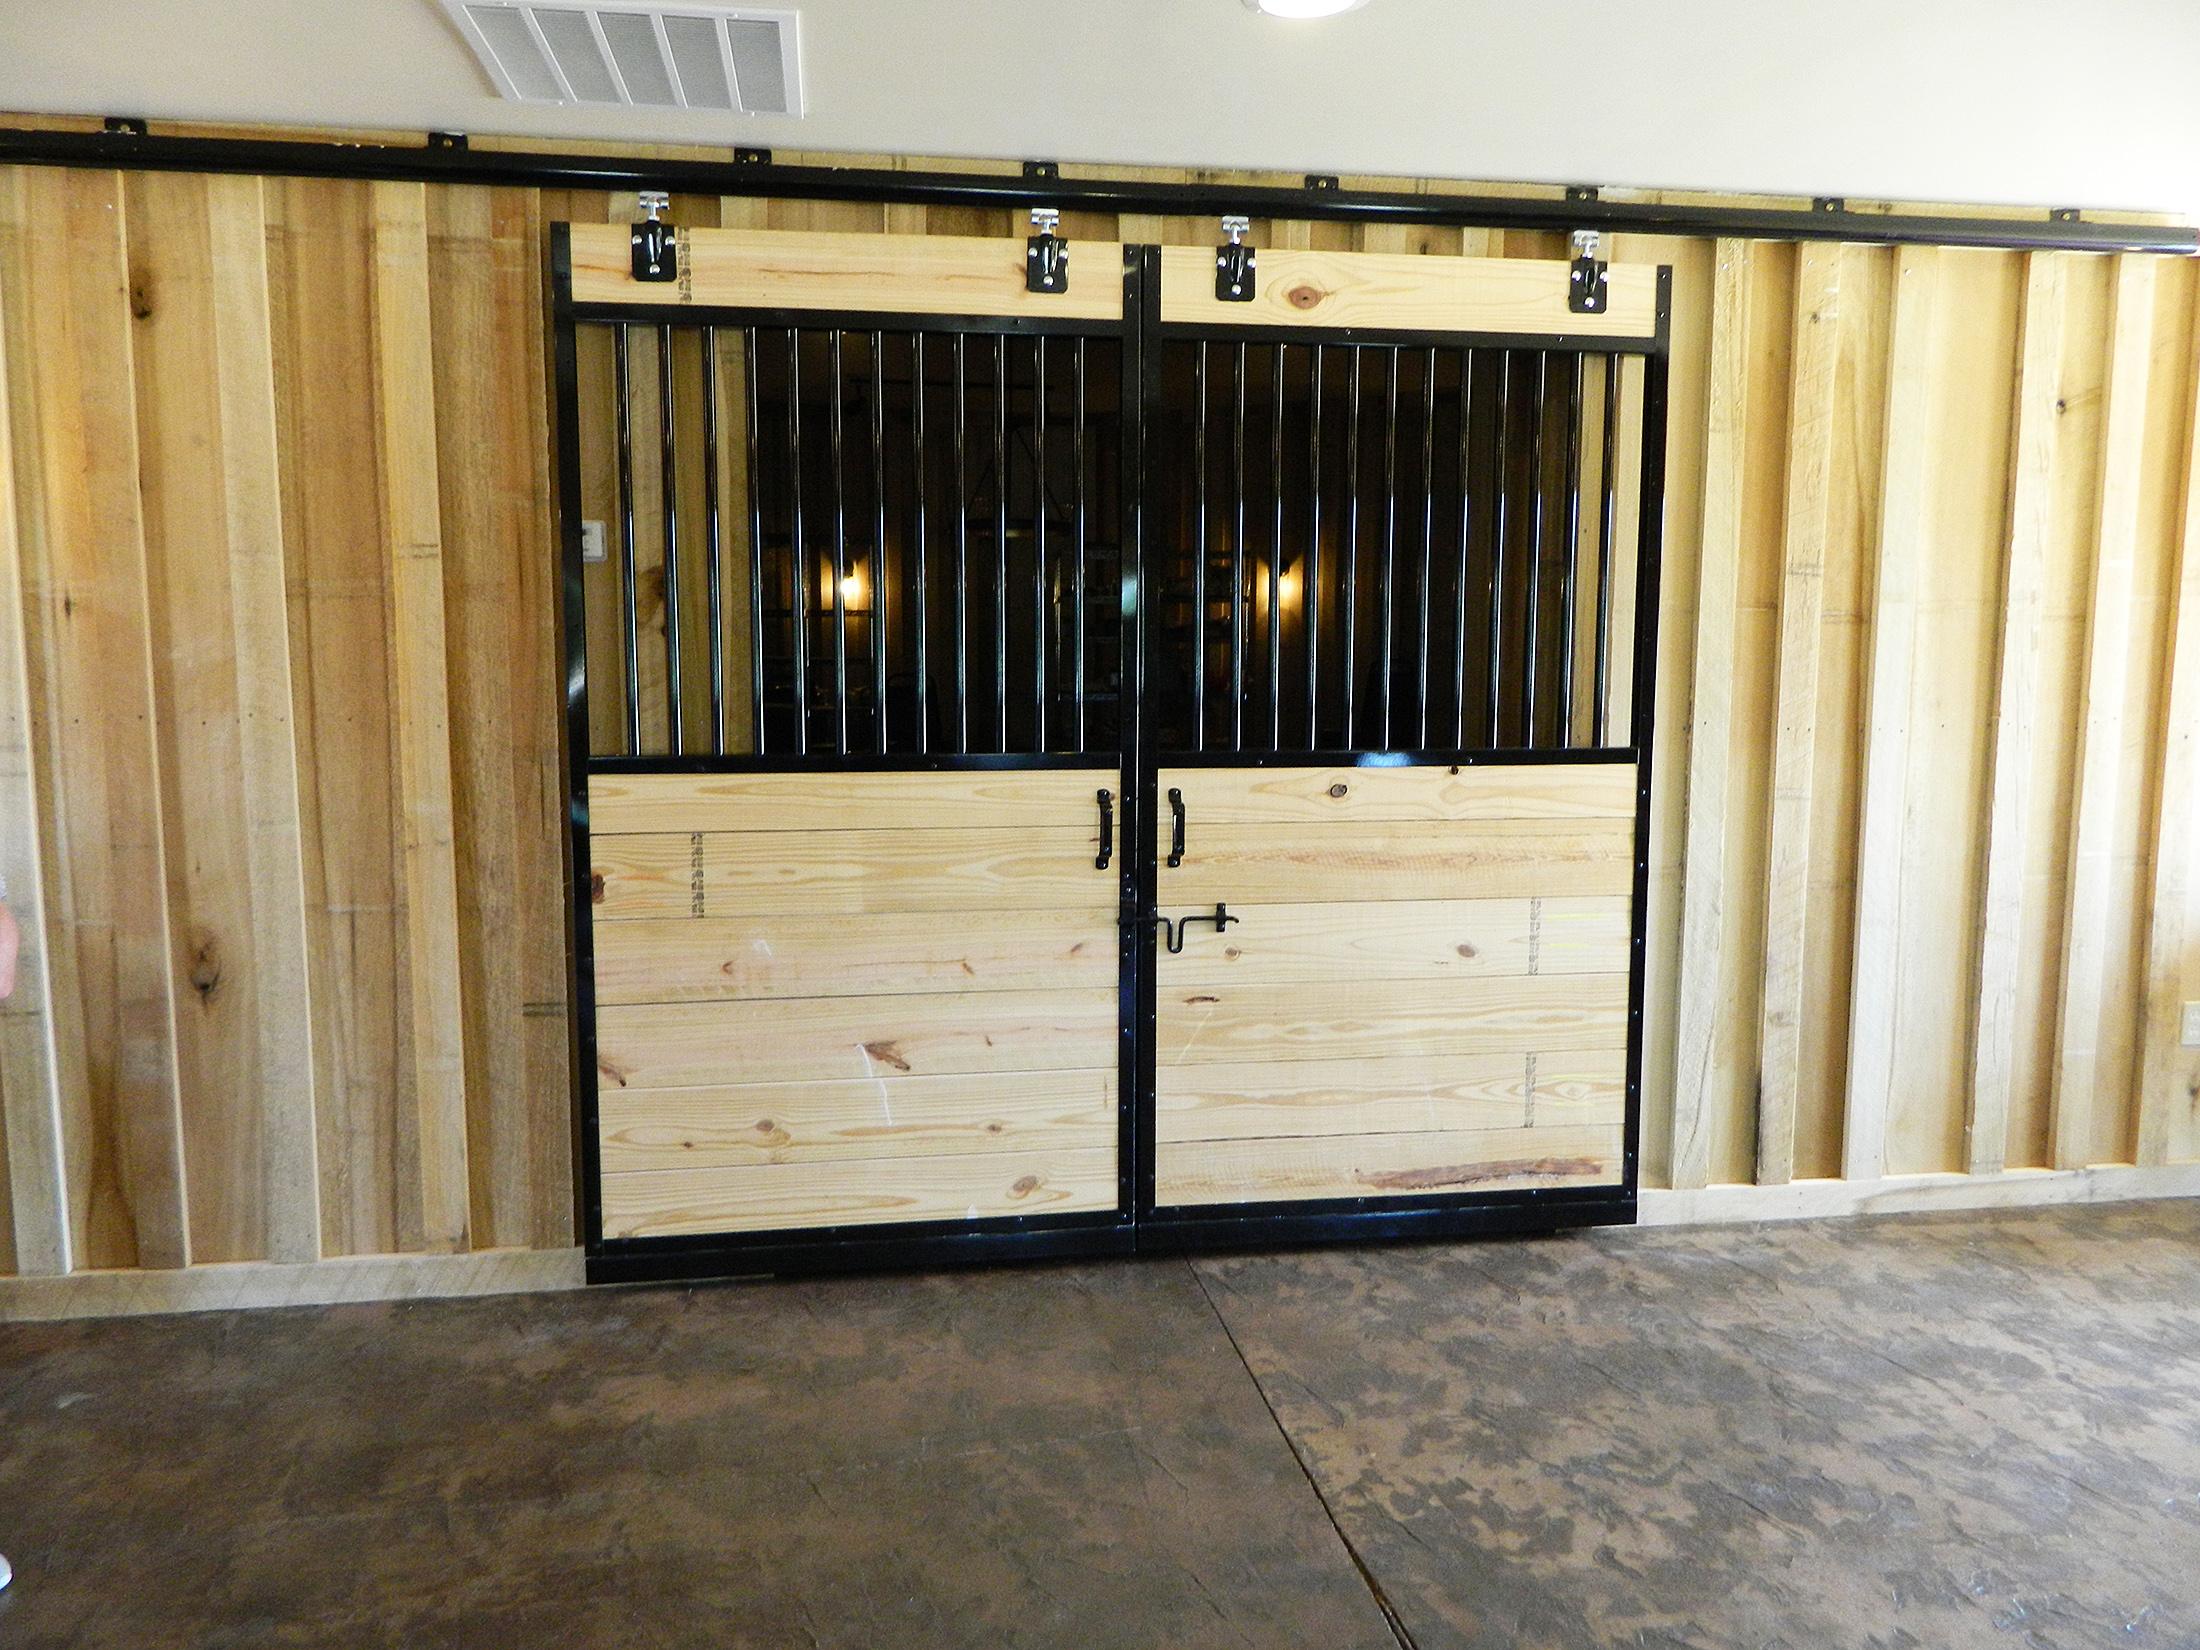 Barrel Room entrance